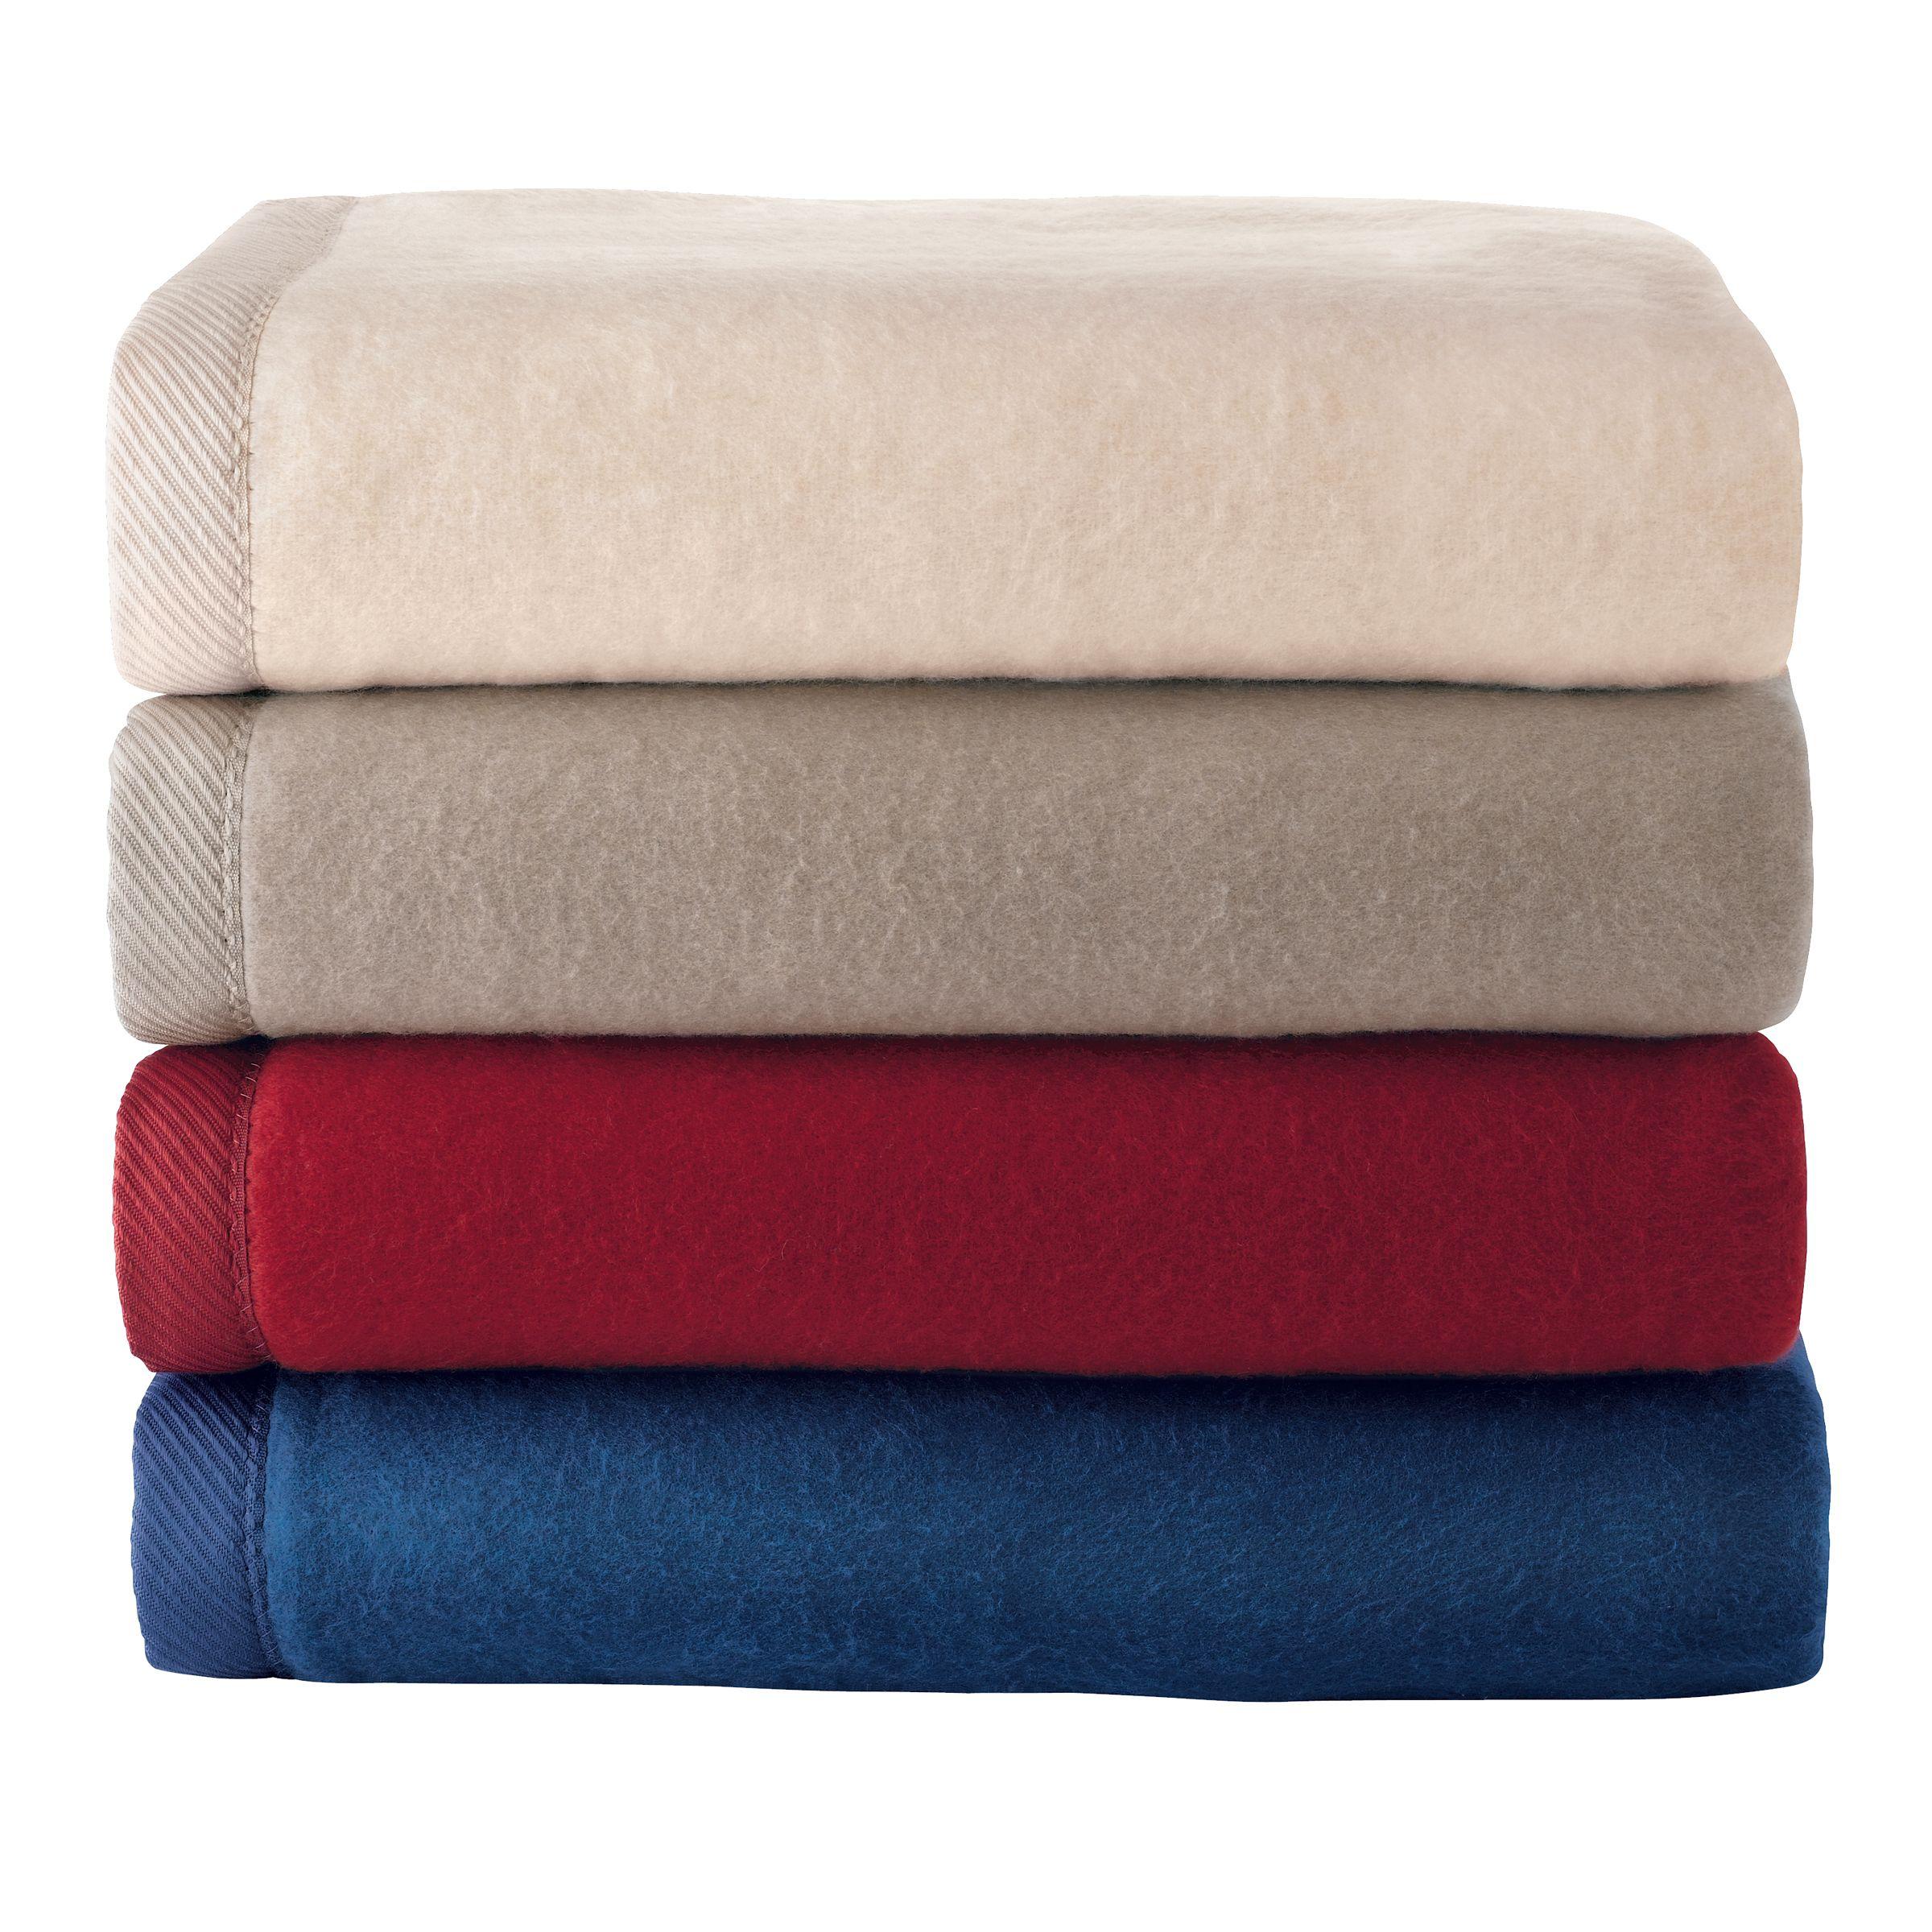 Sunbeam Imperial Nights Heated Blanket